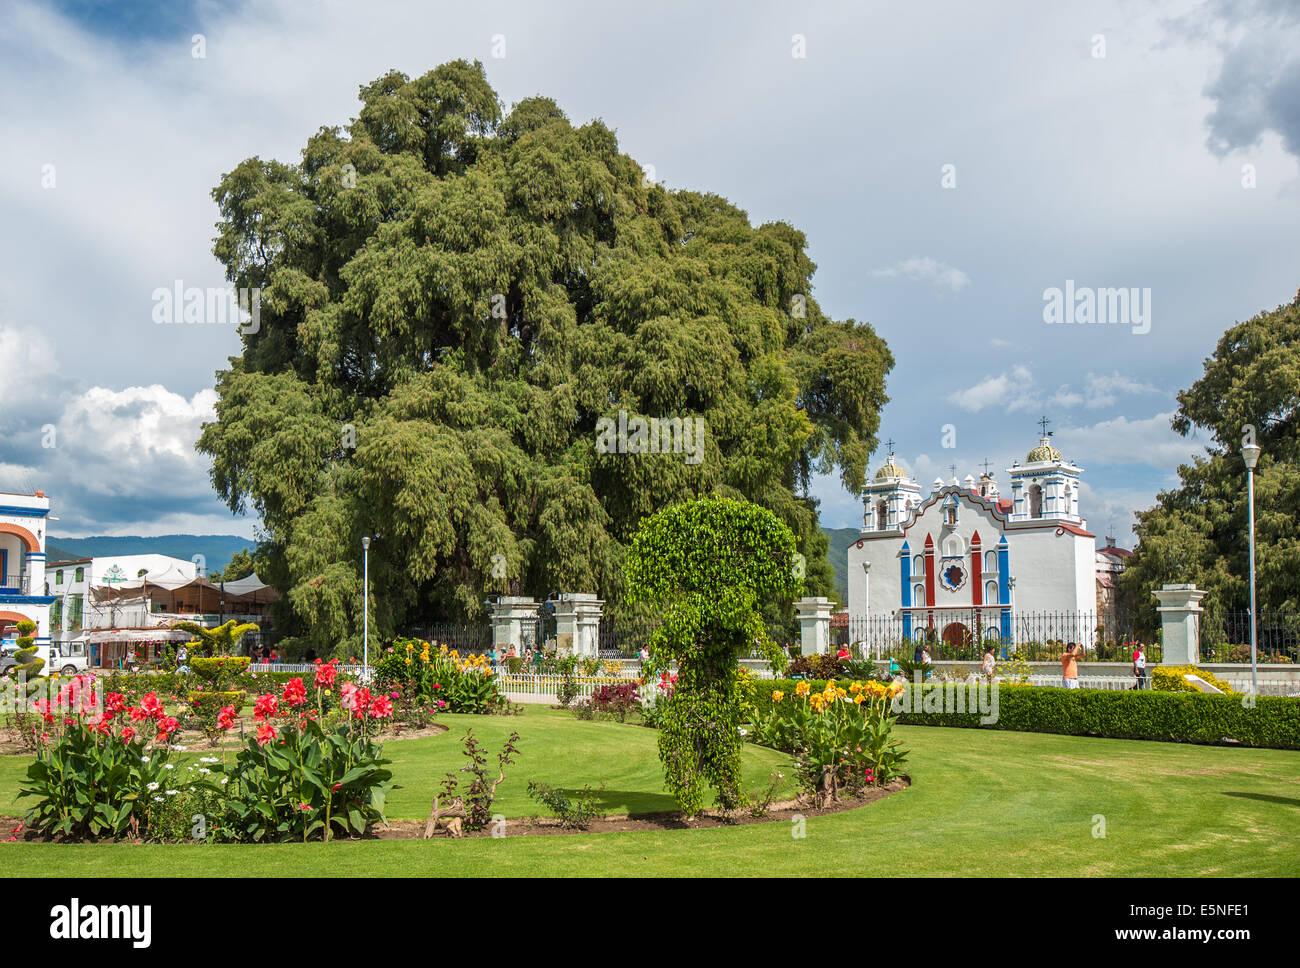 Arbol del Tule, a giant sacred tree in Tule, Oaxaca, Mexico - Stock Image